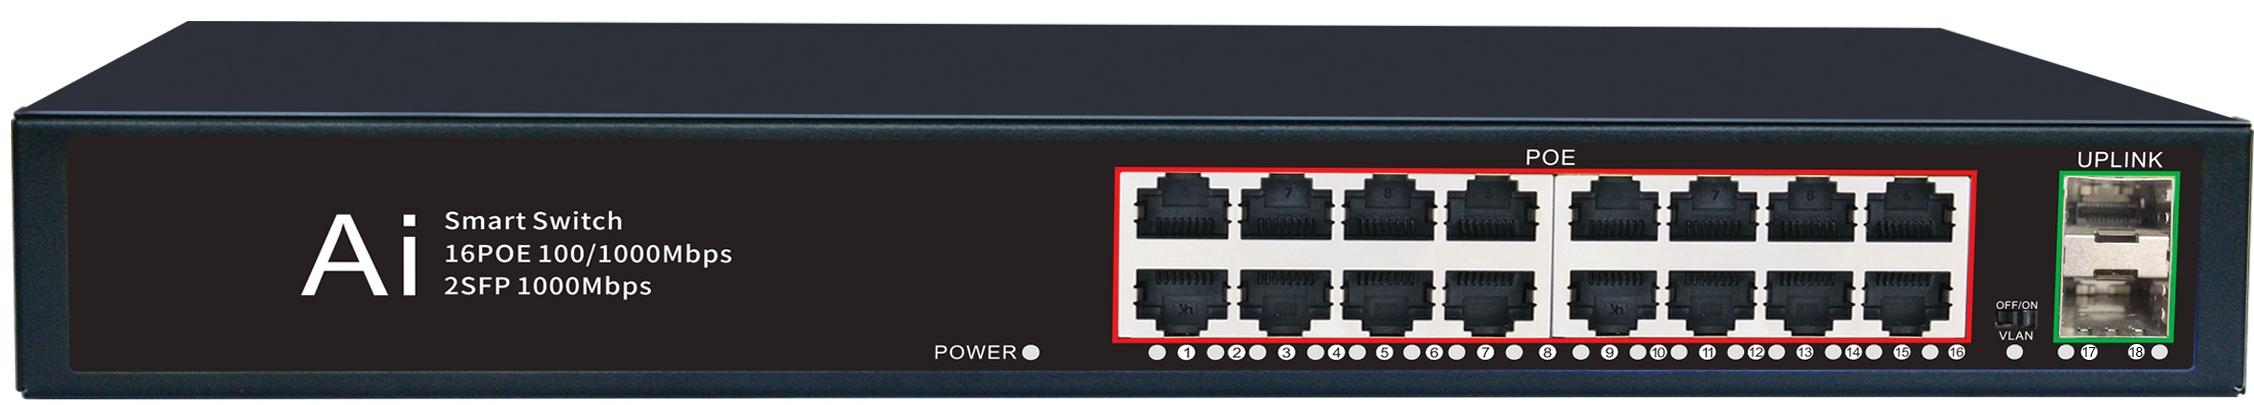 16 Ports 10/100/1000M PoE Port+2 Gigabit SFP Fiber Port, Smart PoE Switch JHA-P420016BMH Featured Image